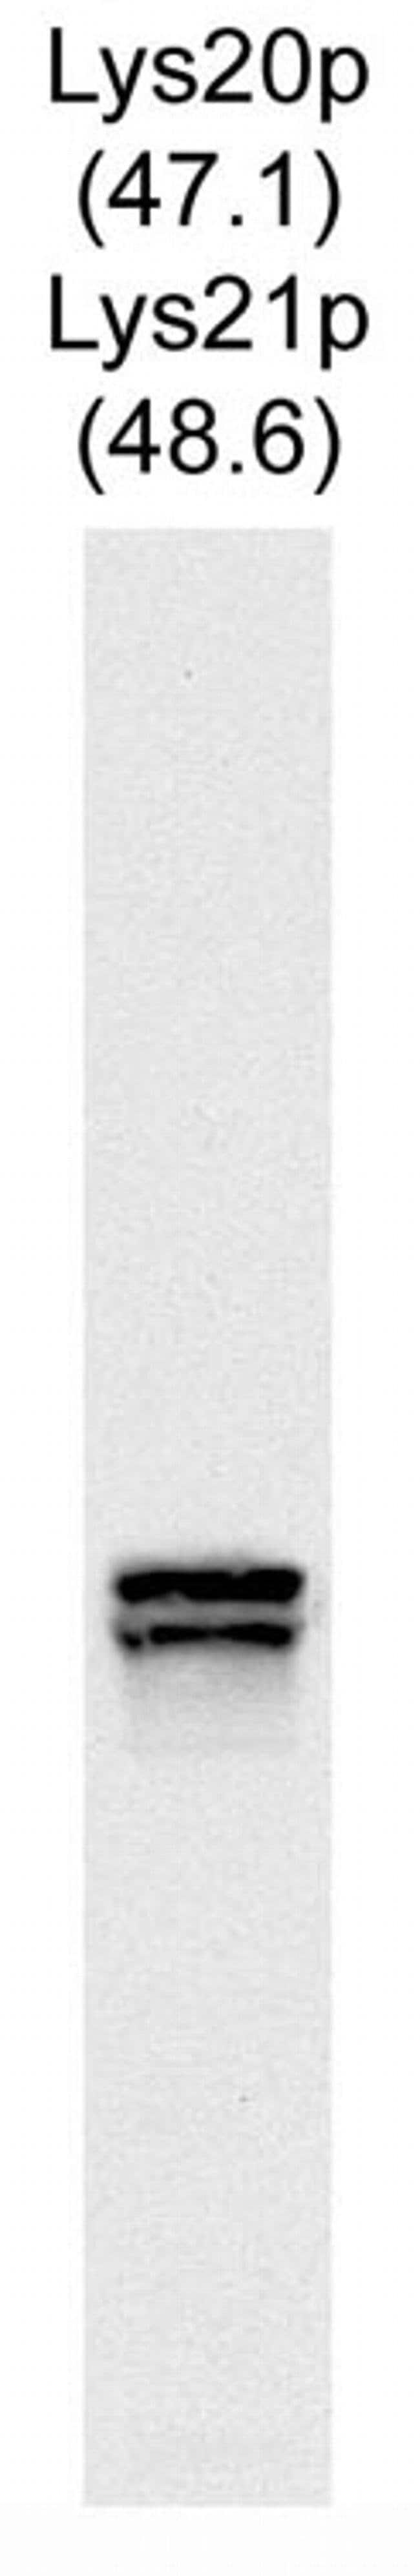 Lys20/Lys21 Mouse anti-Yeast, Clone: 31F5, Invitrogen 100 µL; Unconjugated